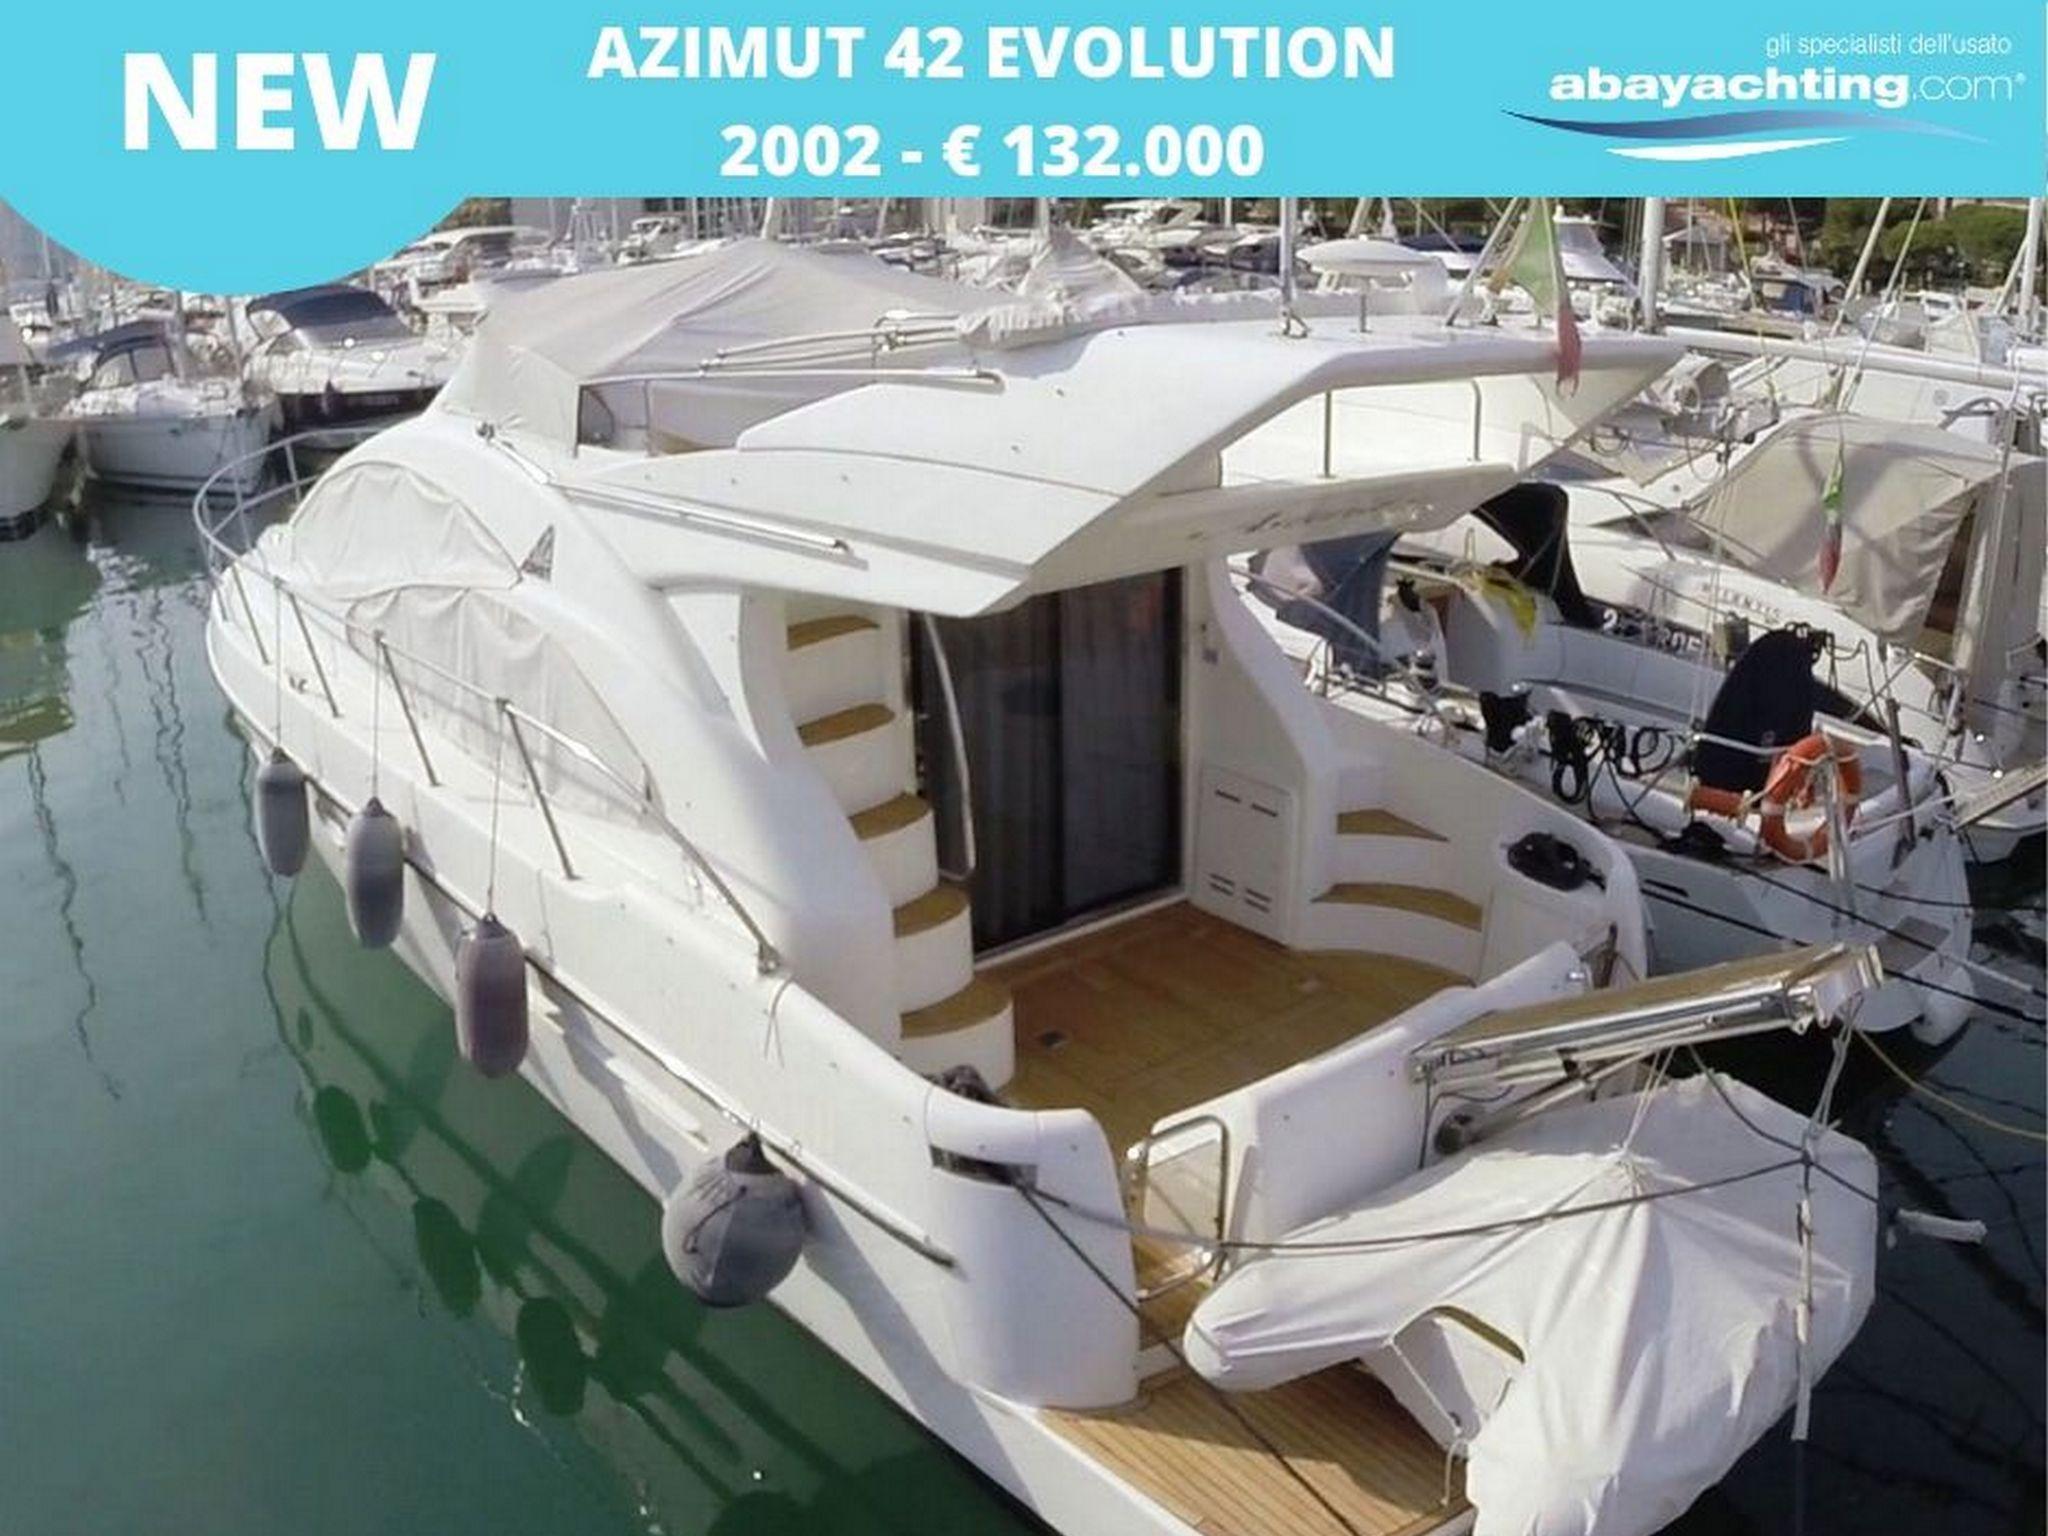 Nuovo arrivo Azimut 42 Evolution